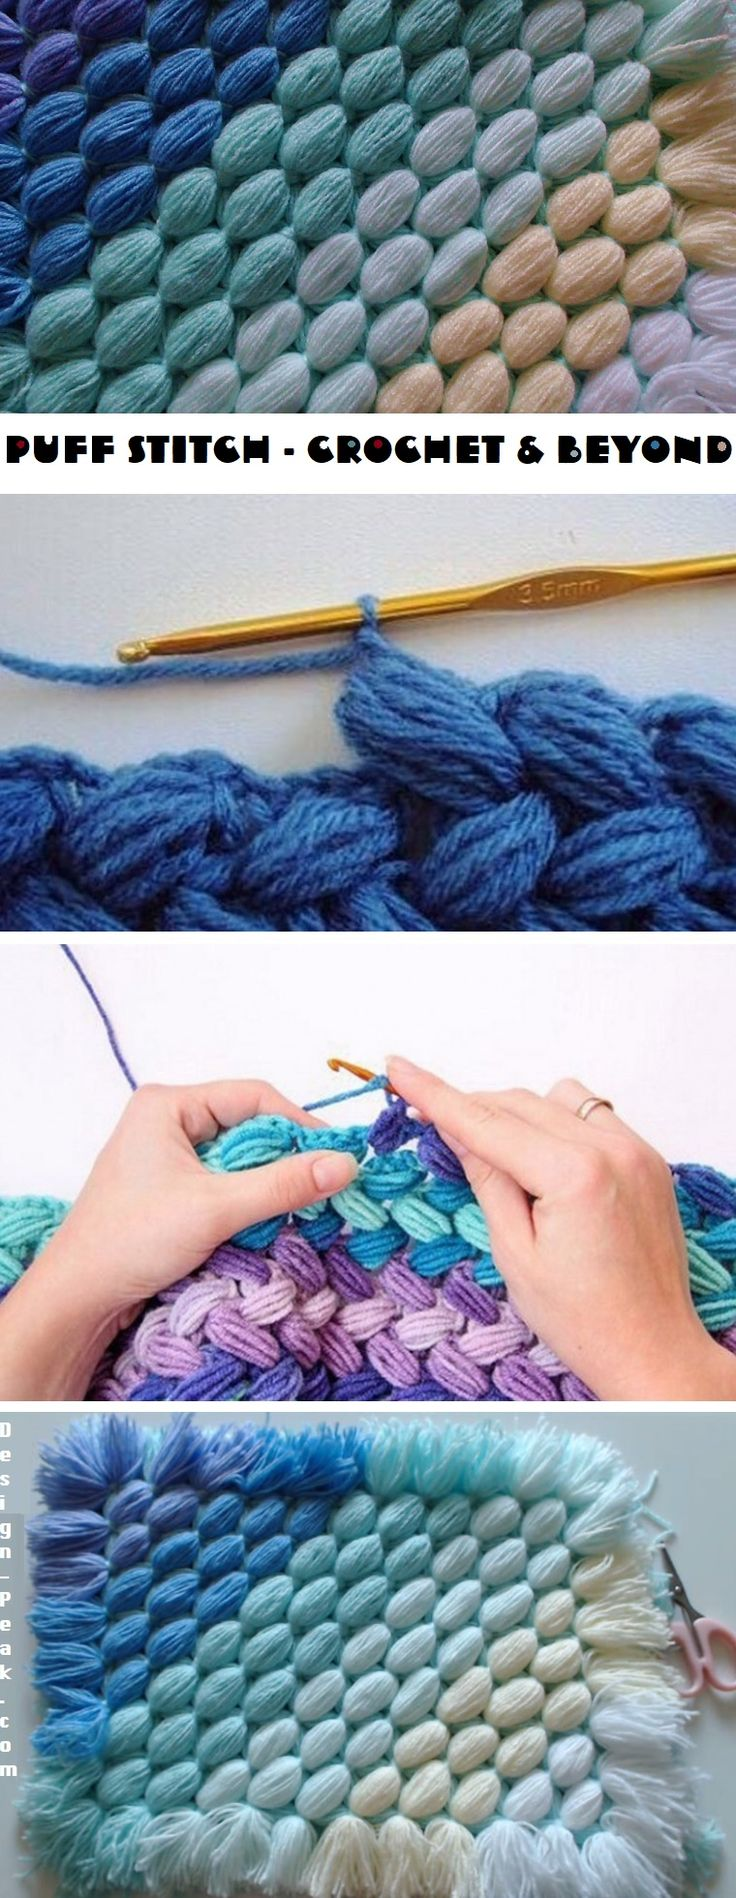 Puff Stitch – Crochet